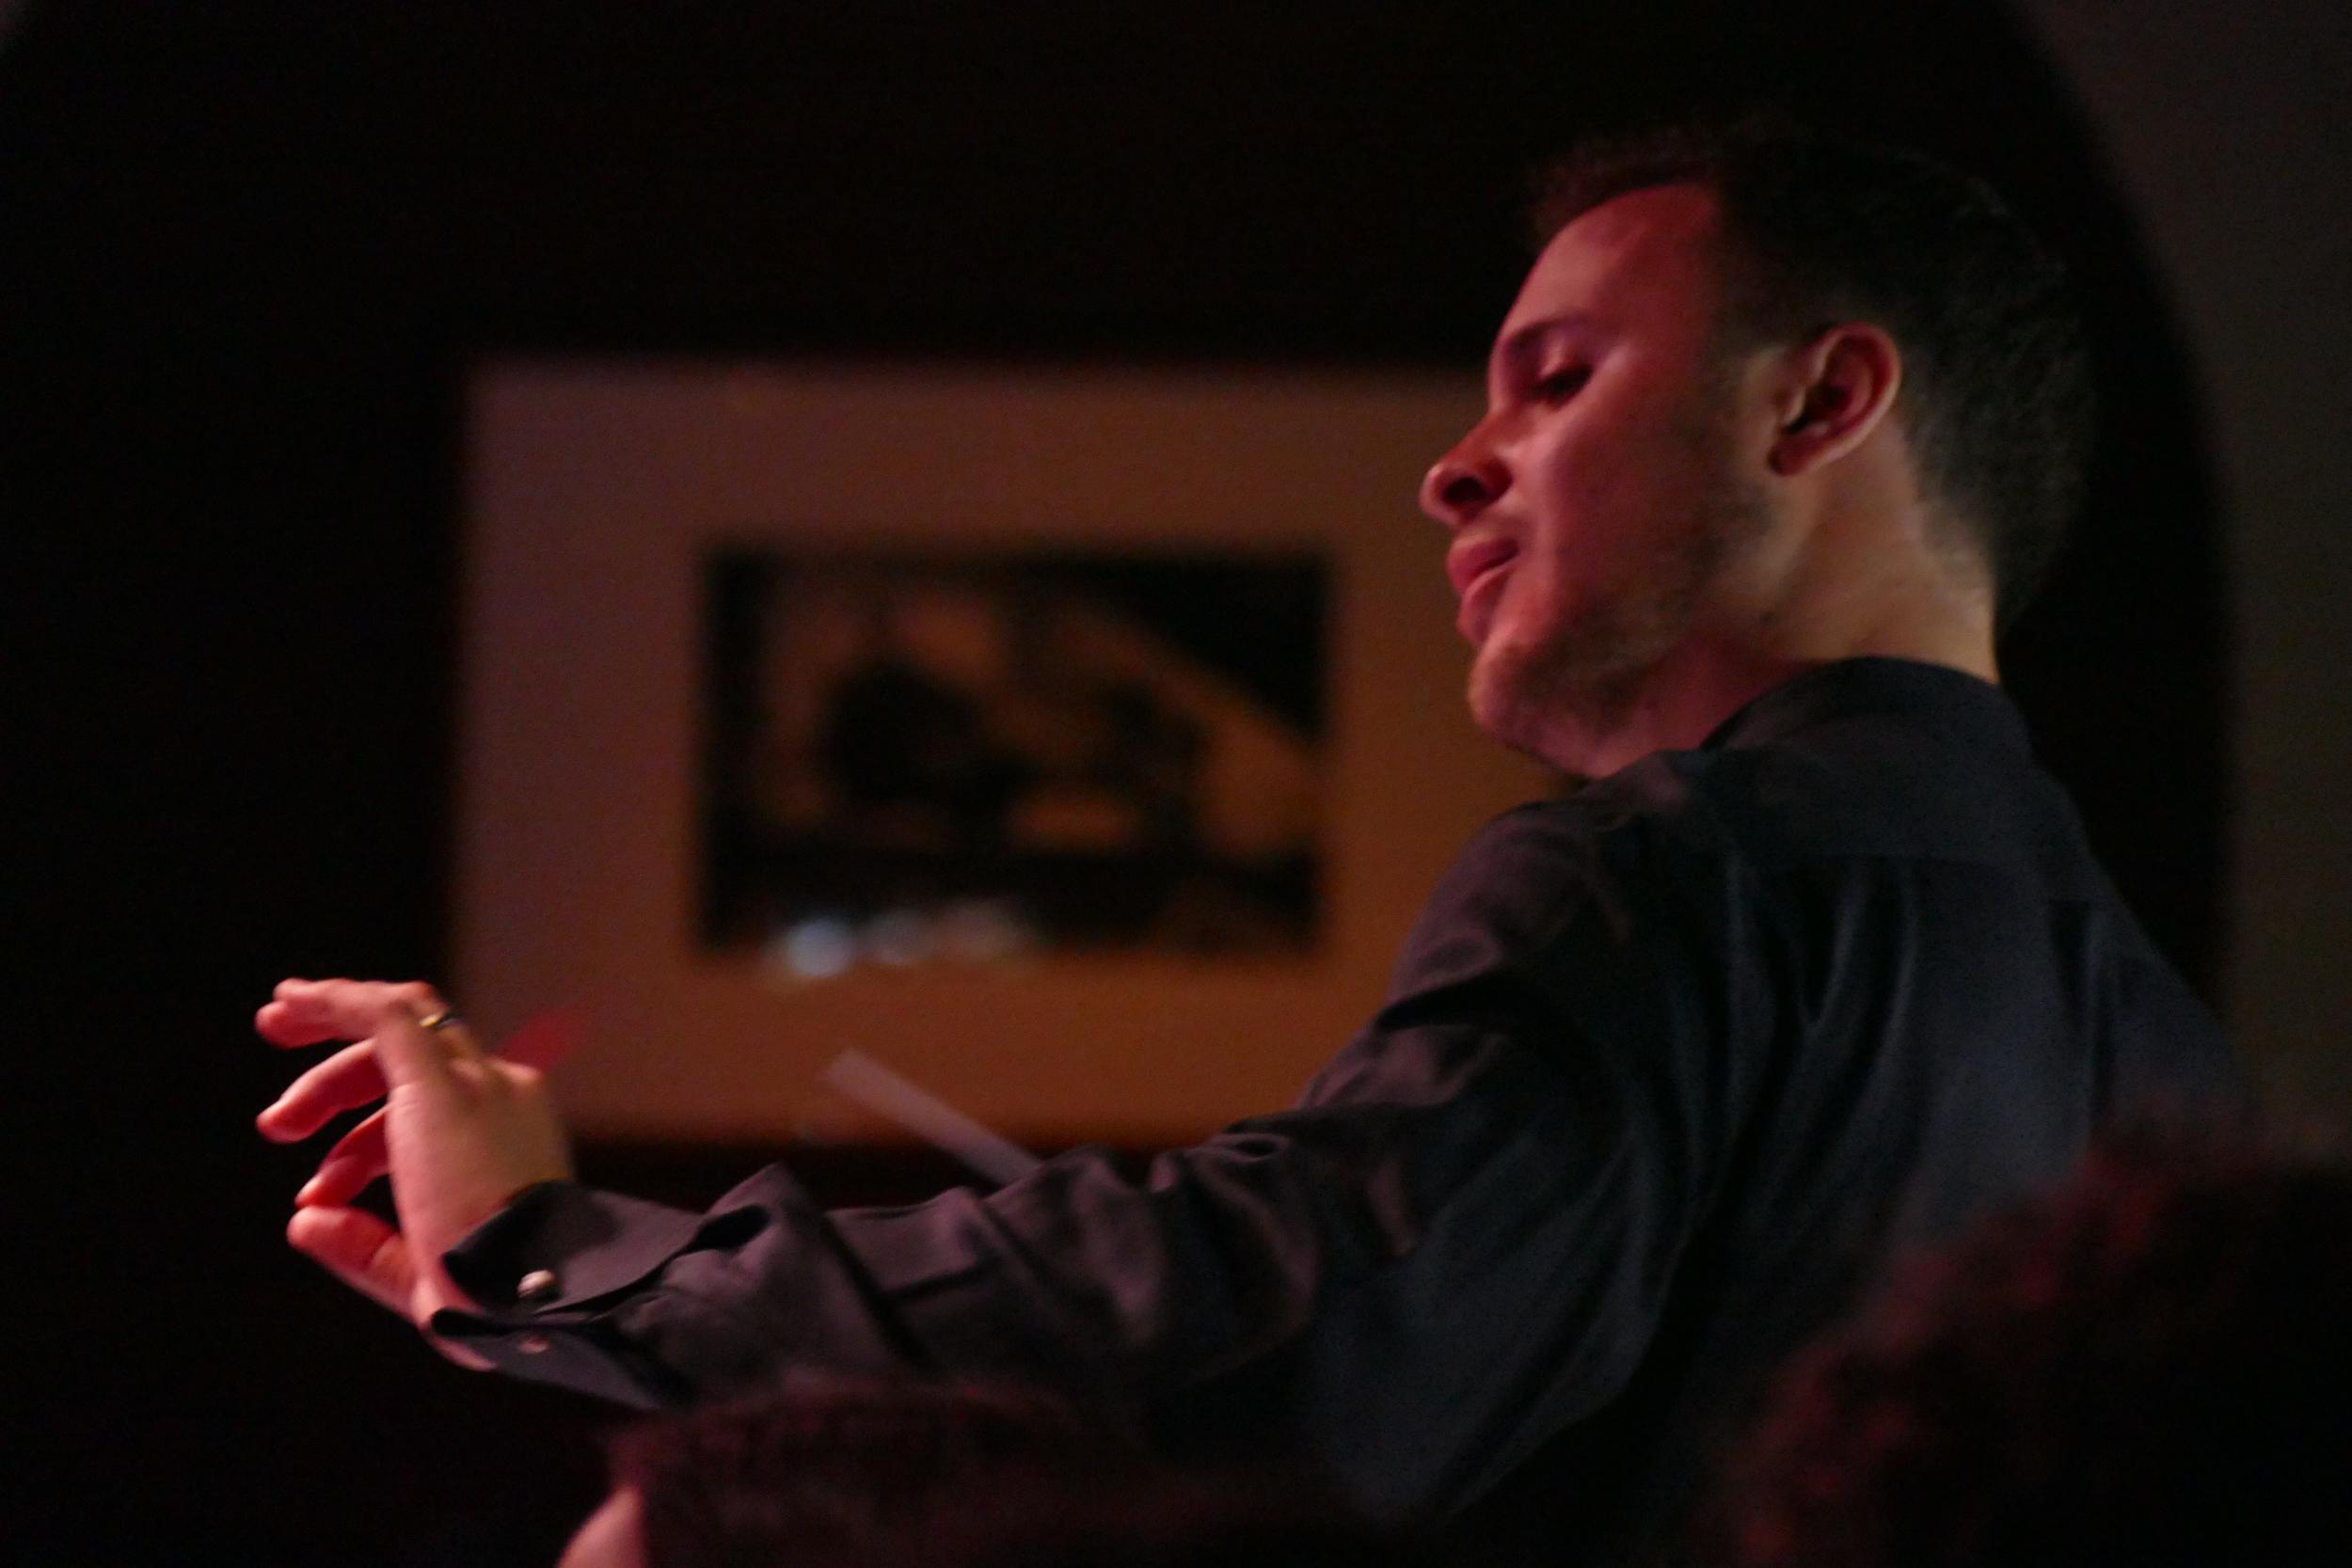 John Devlin, music director, Gourmet Symphony